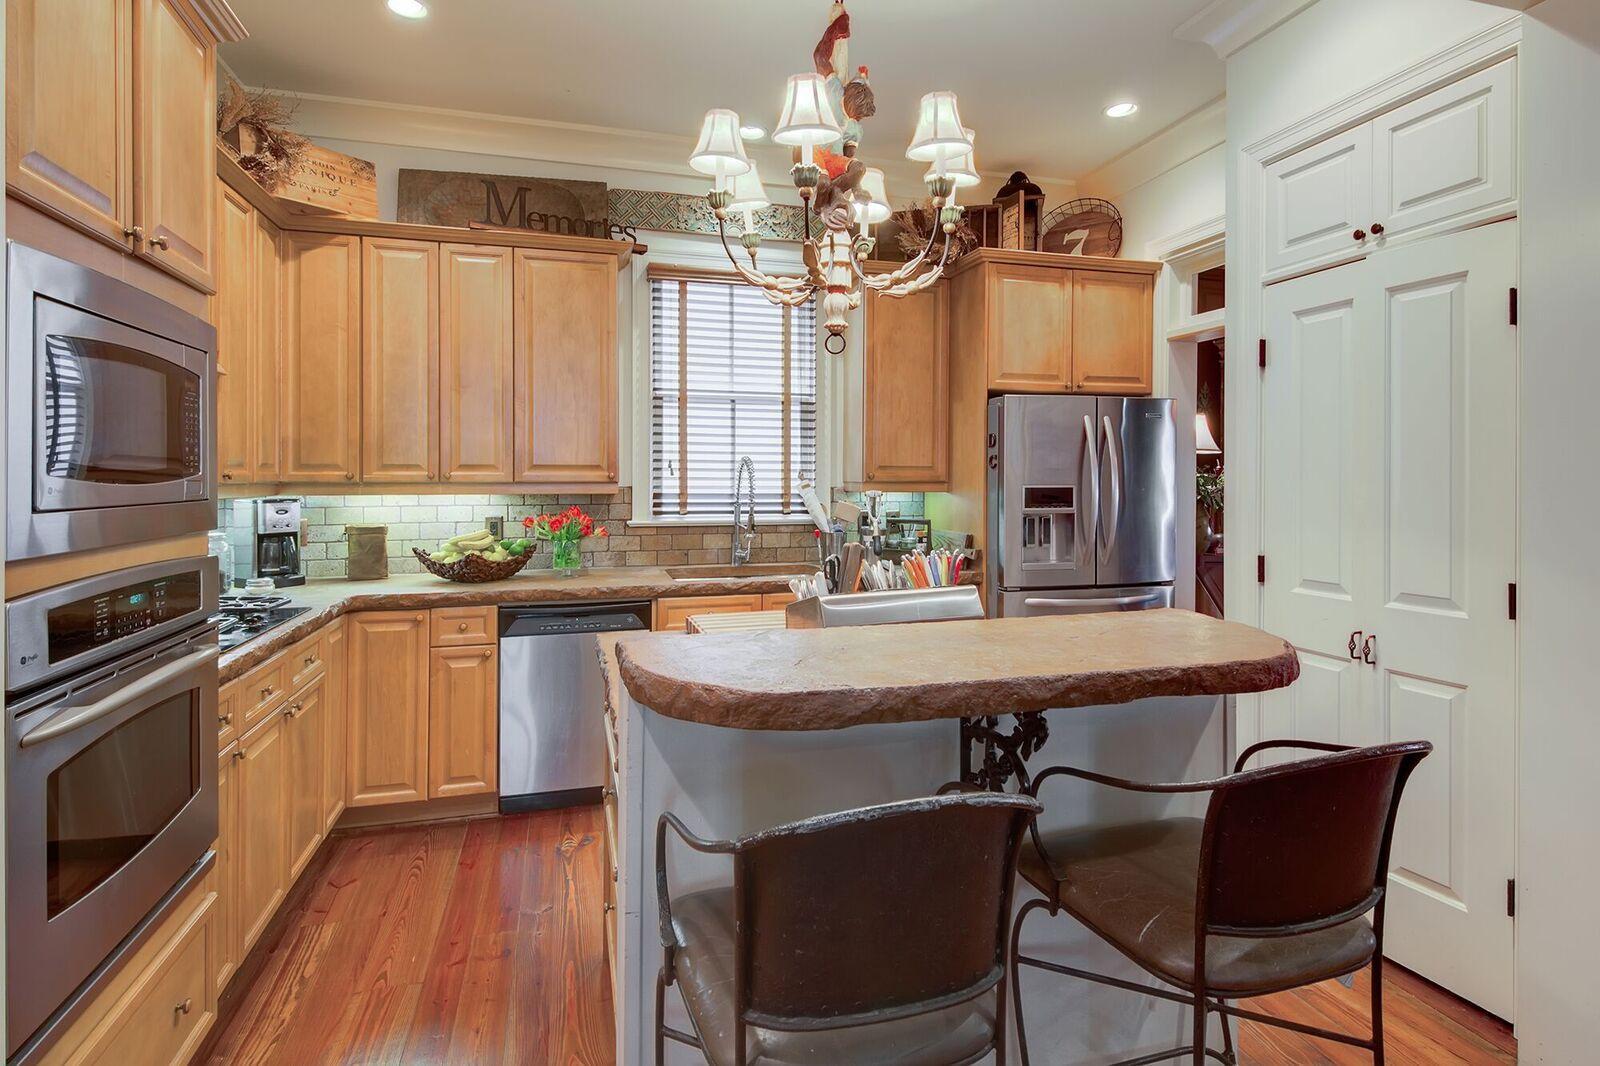 Home for sale 150 Ionsborough Street, Ion, Mt. Pleasant, SC